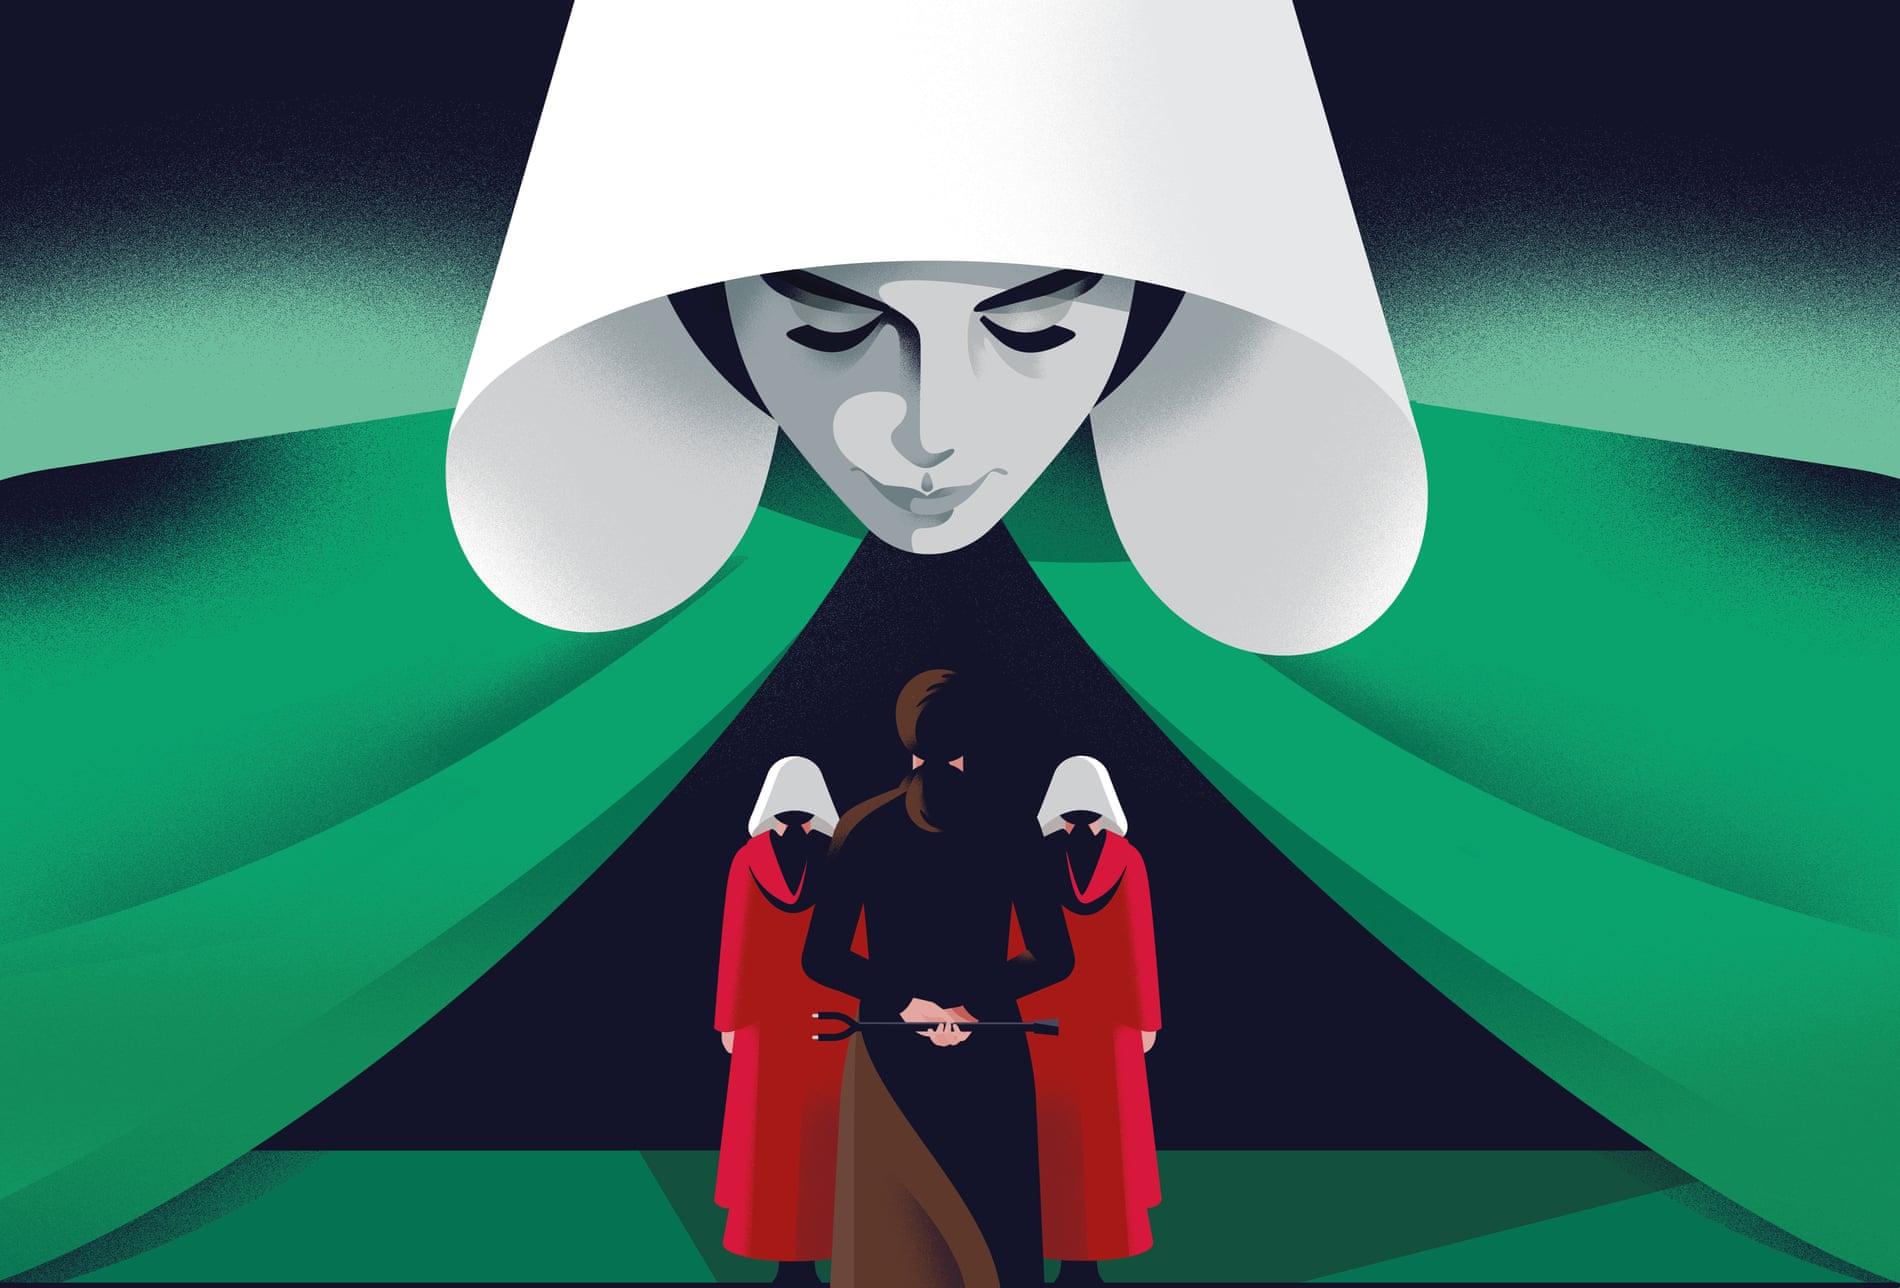 Os Testamentos, Margaret Atwood - resenha